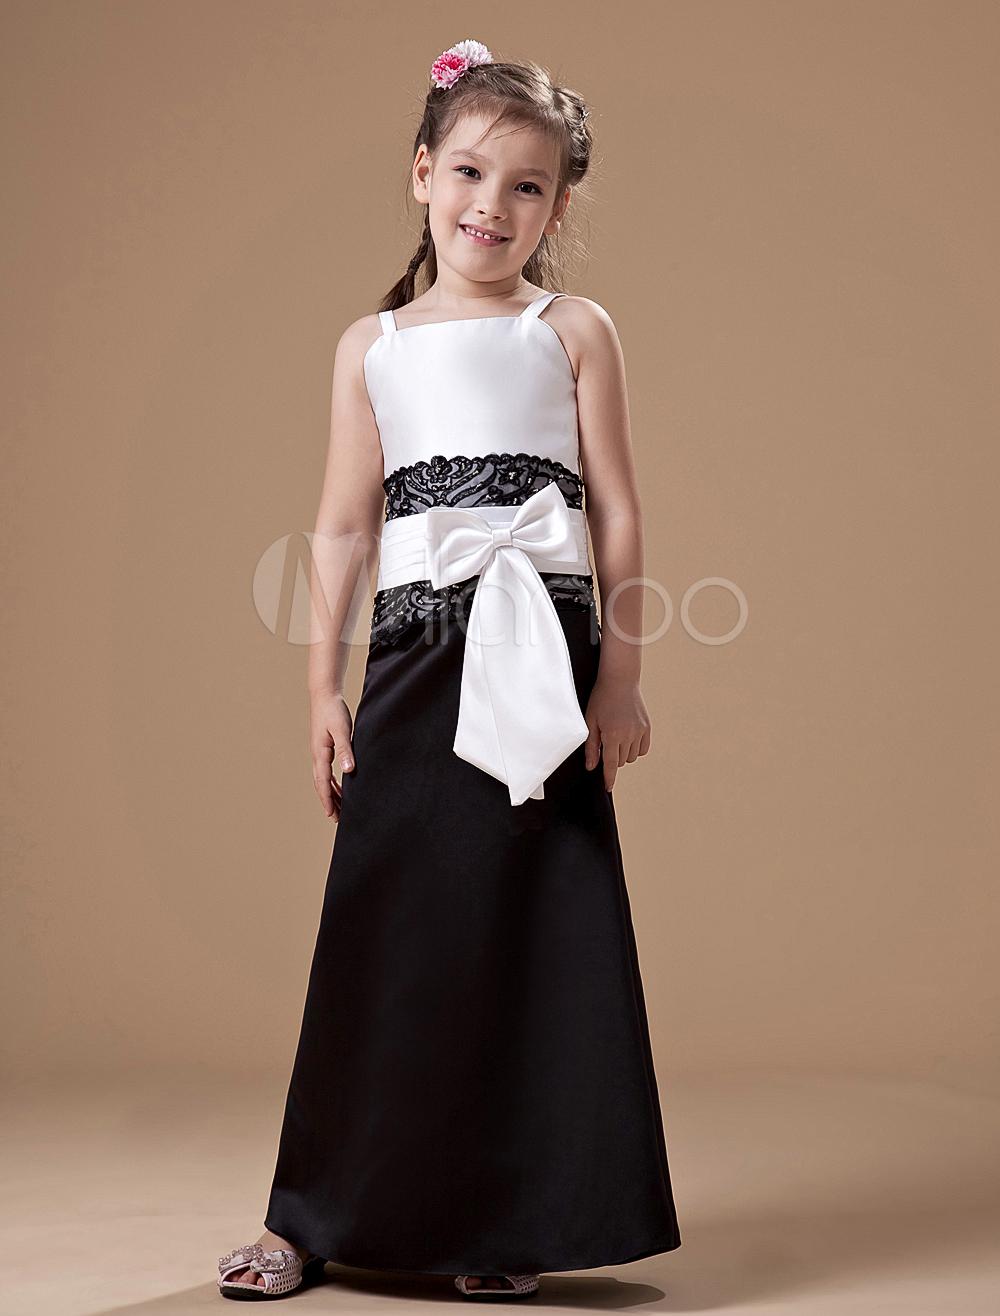 Mermaid Satin Junior Bridesmaid Dress with Sash Spaghetti Straps